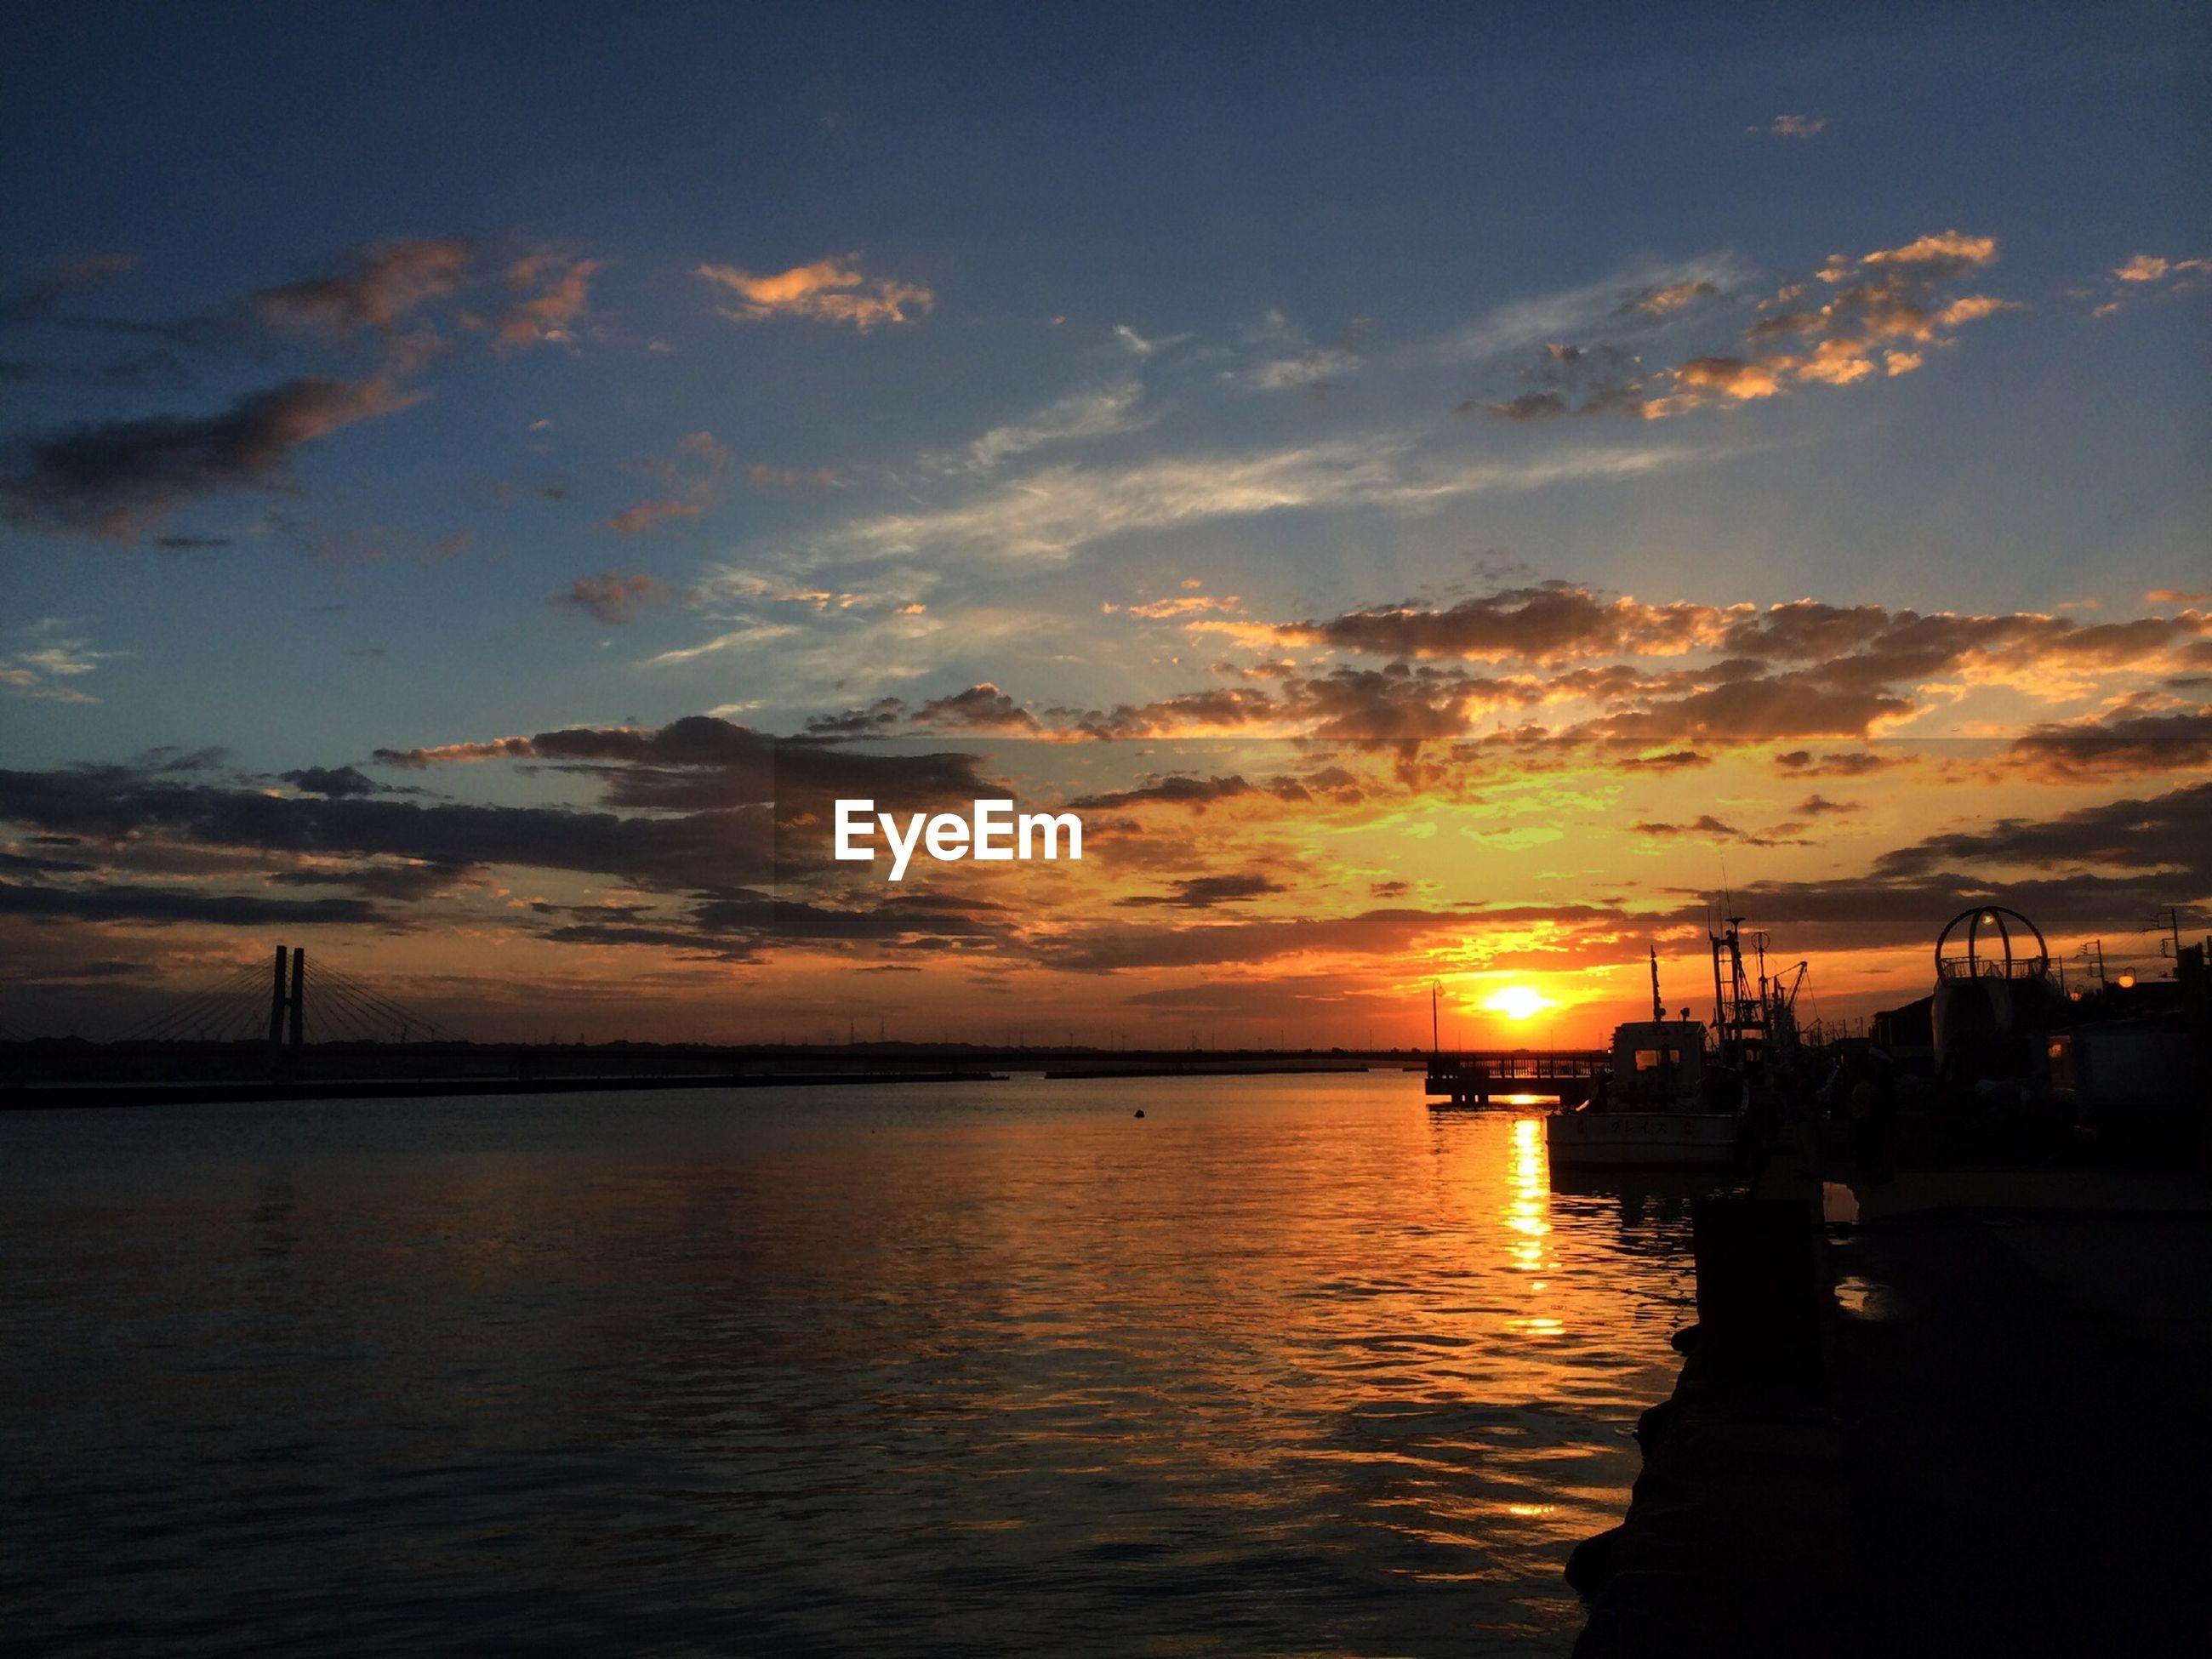 sunset, water, silhouette, sea, sky, sun, scenics, orange color, beauty in nature, tranquil scene, tranquility, cloud - sky, waterfront, nautical vessel, idyllic, nature, transportation, reflection, sunlight, cloud